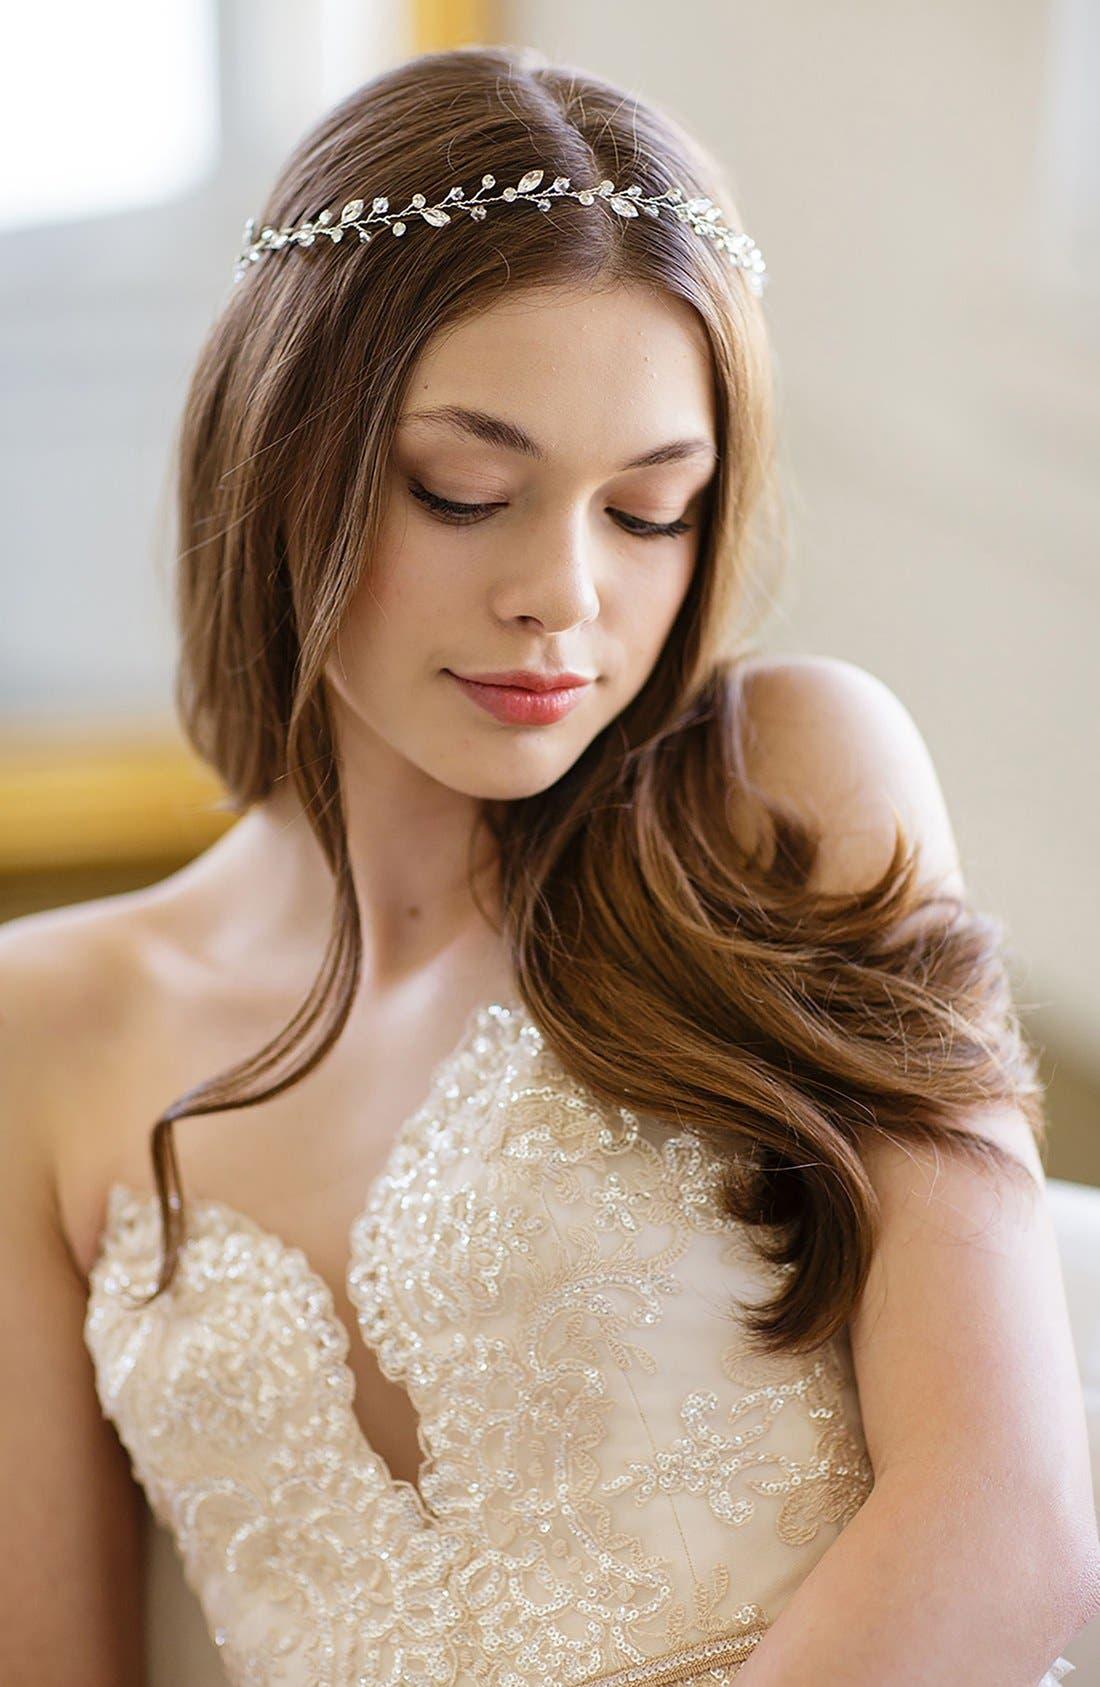 Brides & Hairpins 'Ariel' Crystal Halo & Sash